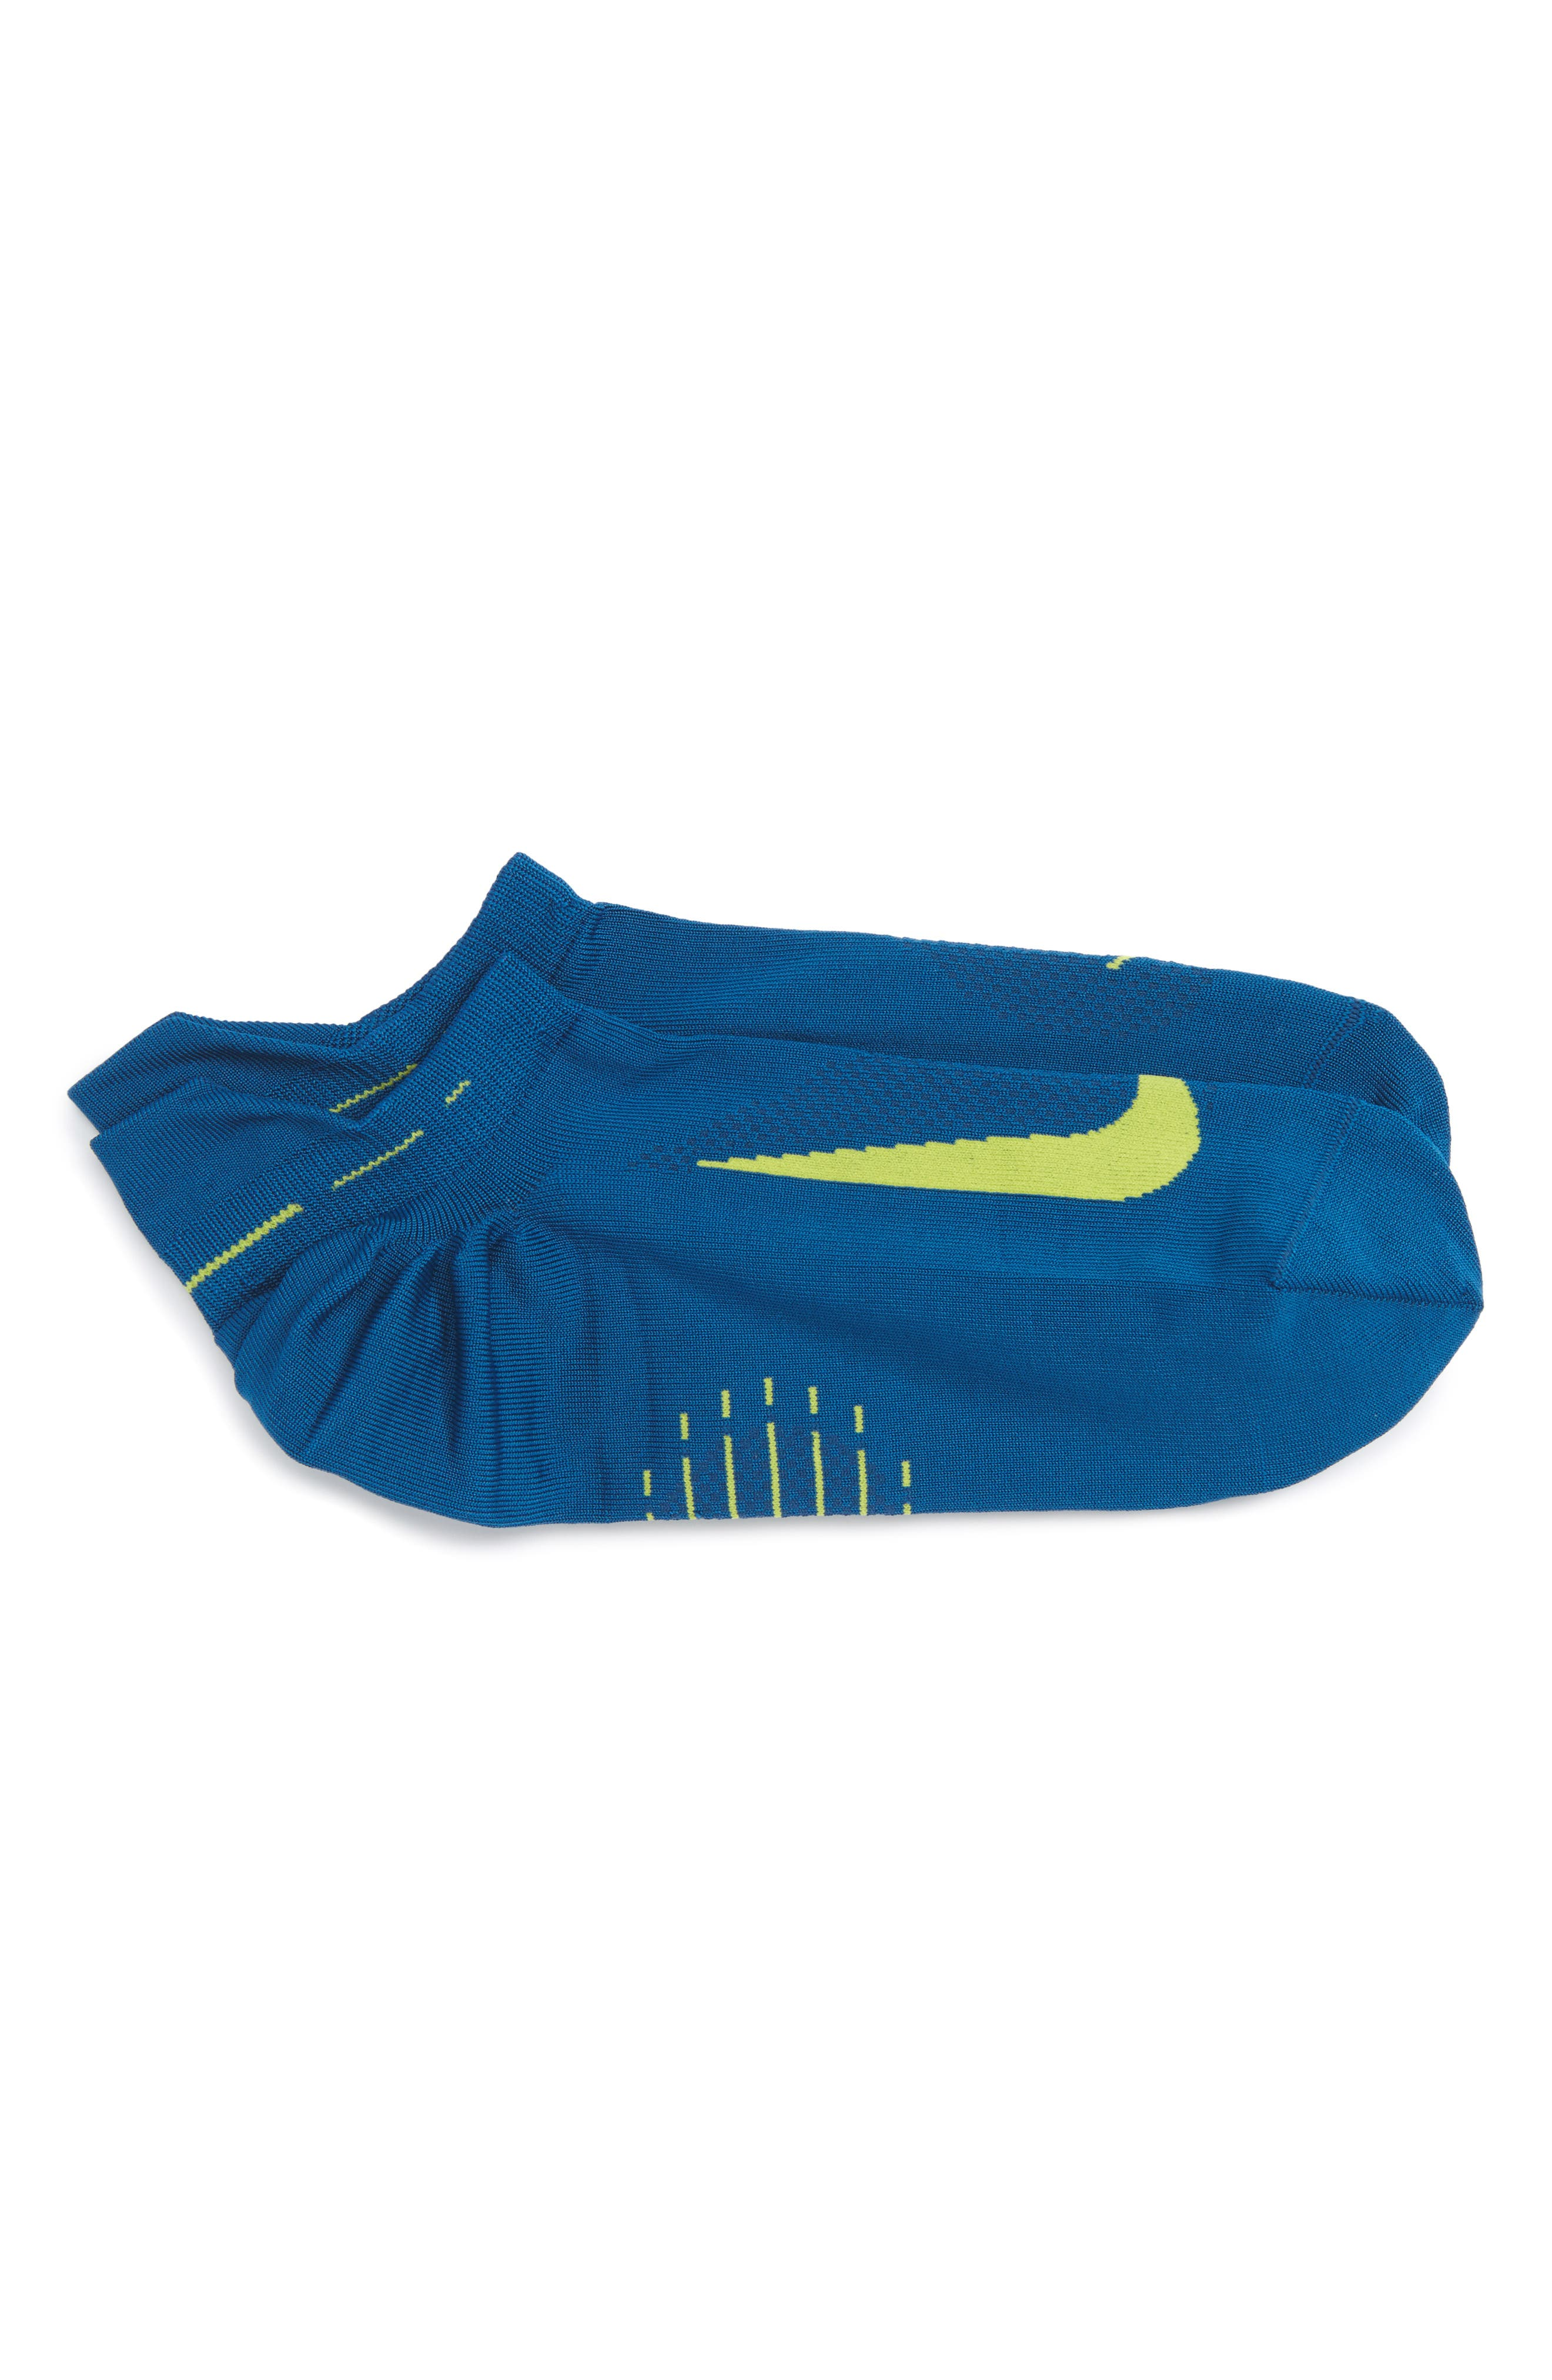 Nike 'Elite' Lightweight No-Show Tab Running Socks